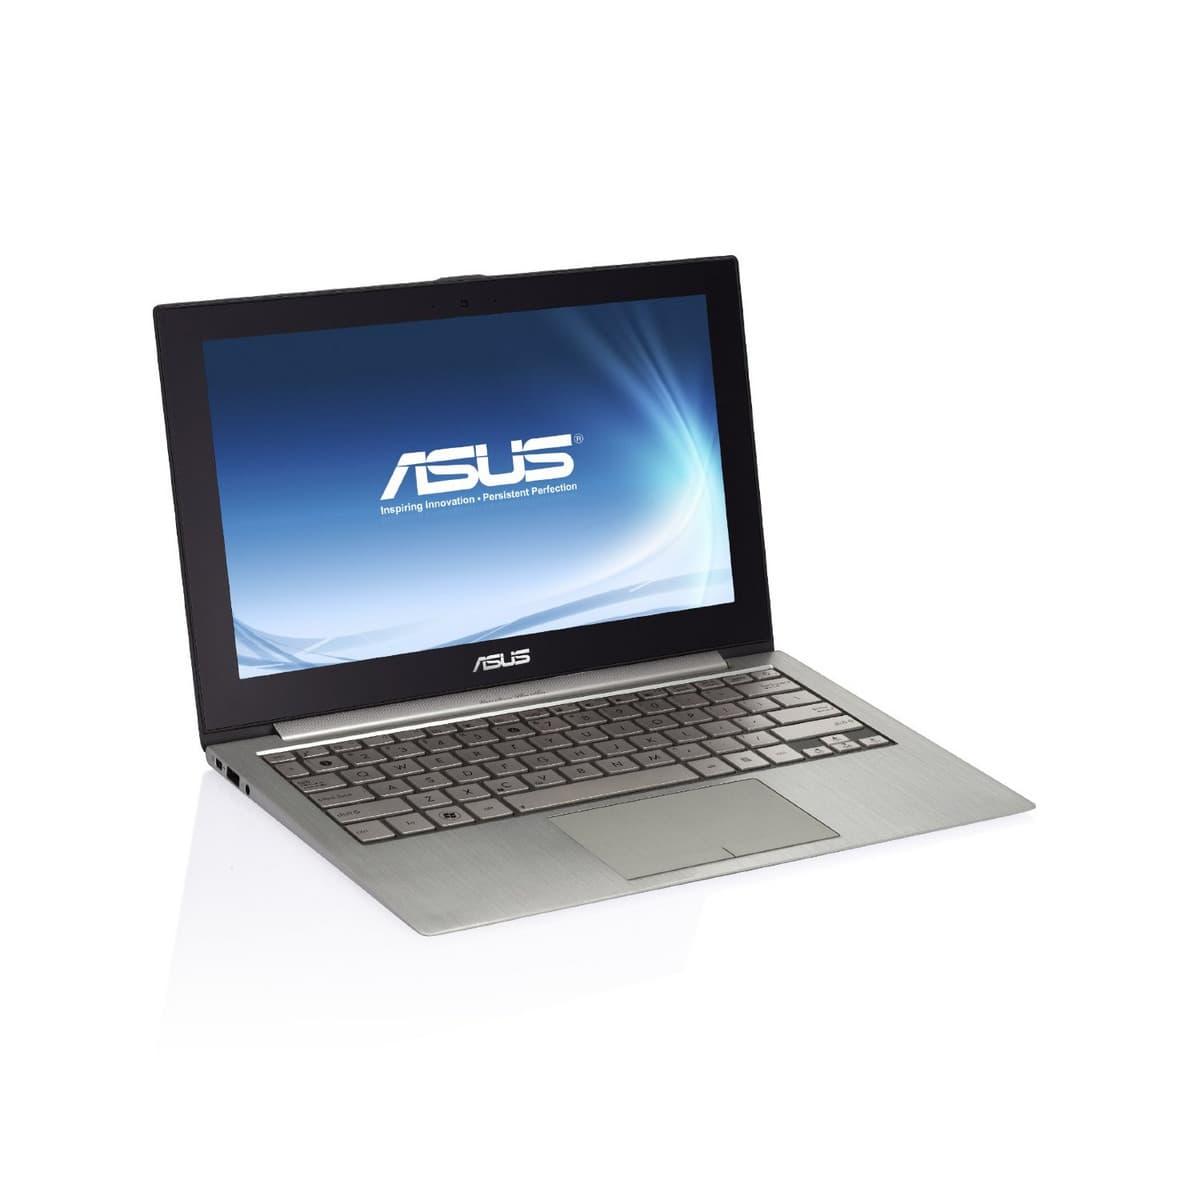 مراجعة سريعة Asus Zenbook UX21E-DH52